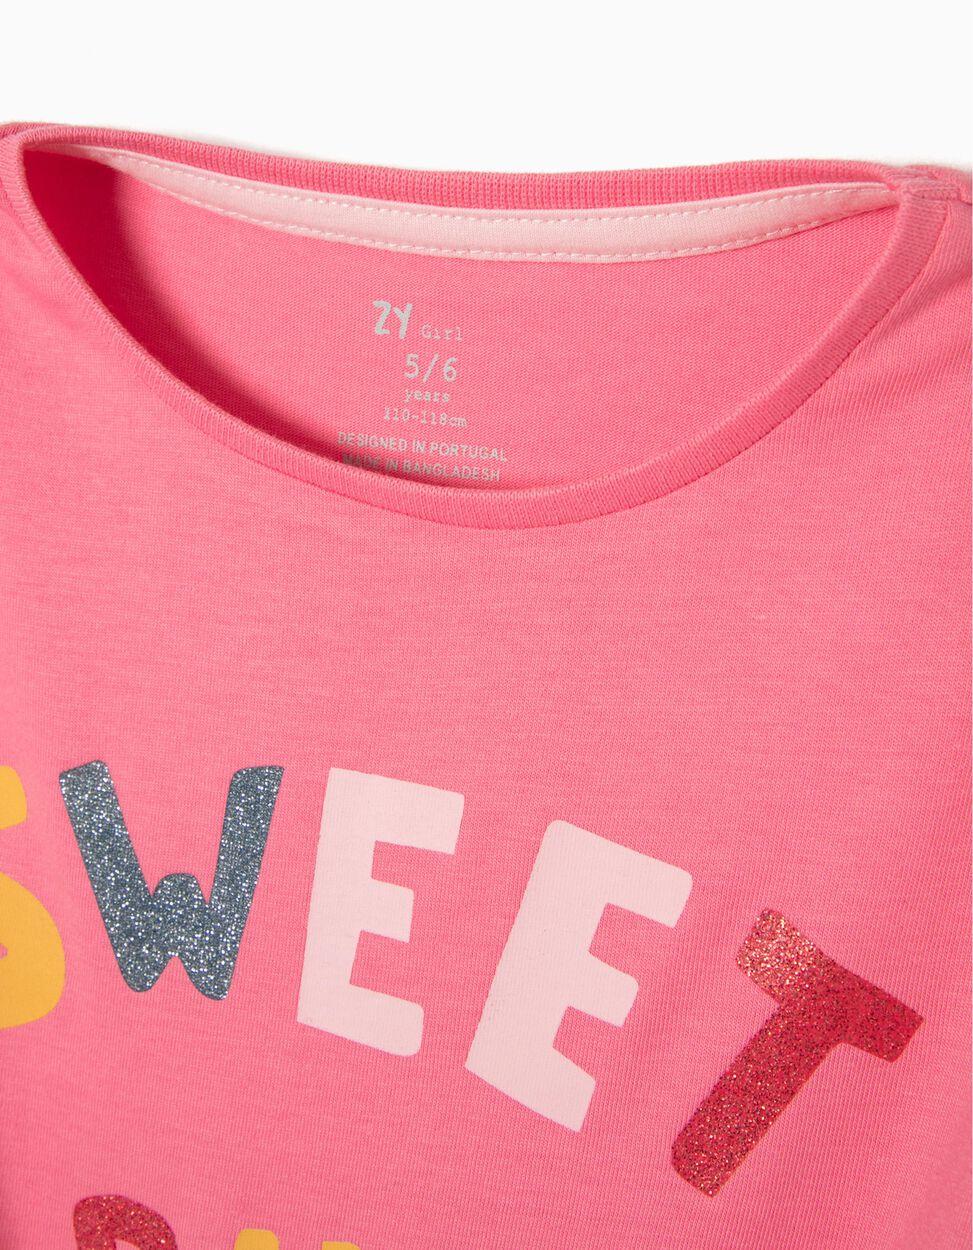 T-shirt Girls Branca